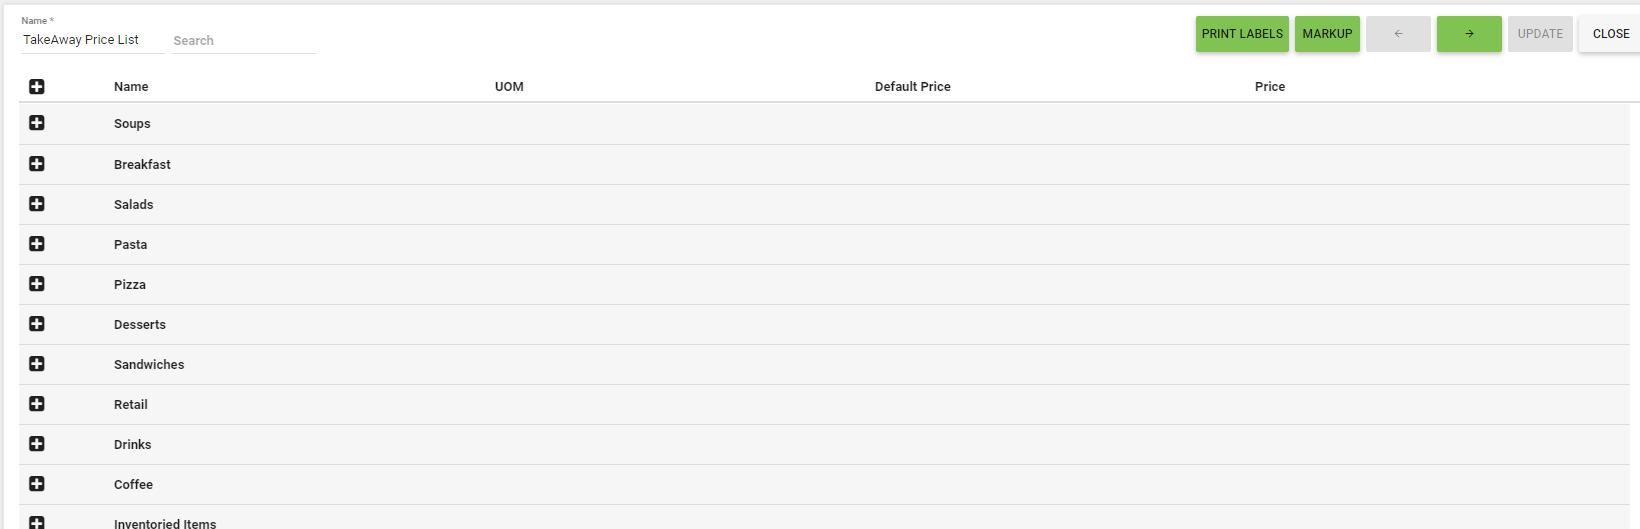 BOM - Items List - Price Lists - Edit - Collapsed